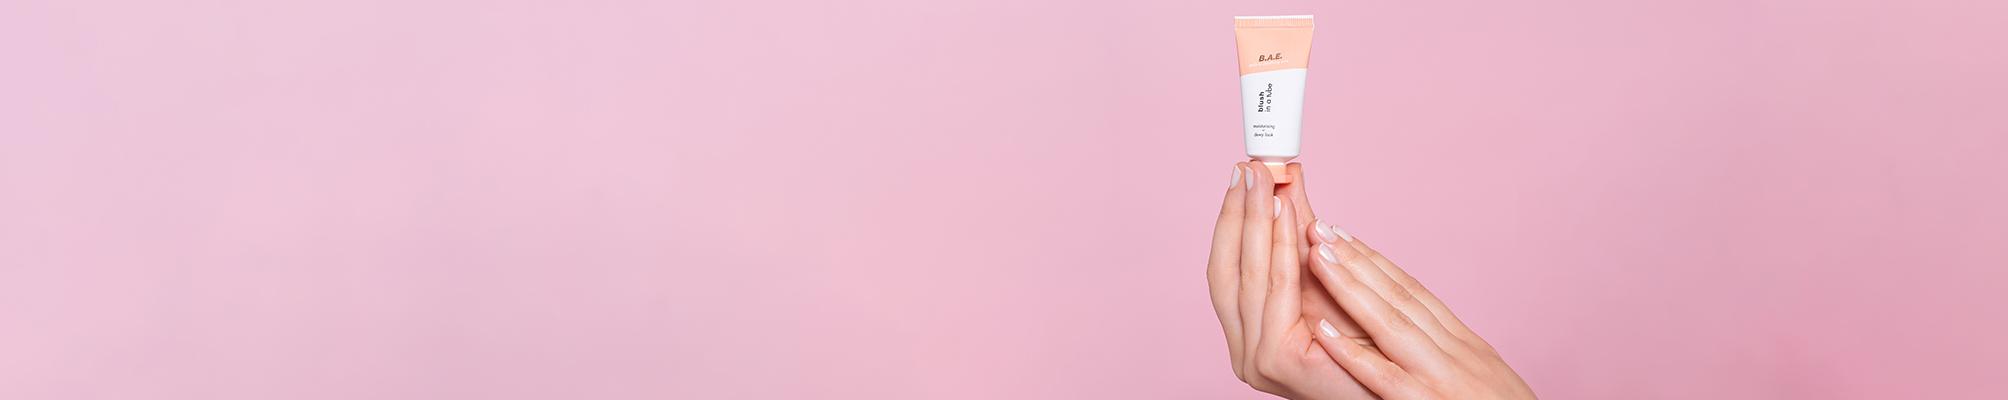 blush en poeder - Herobanner - HEMA